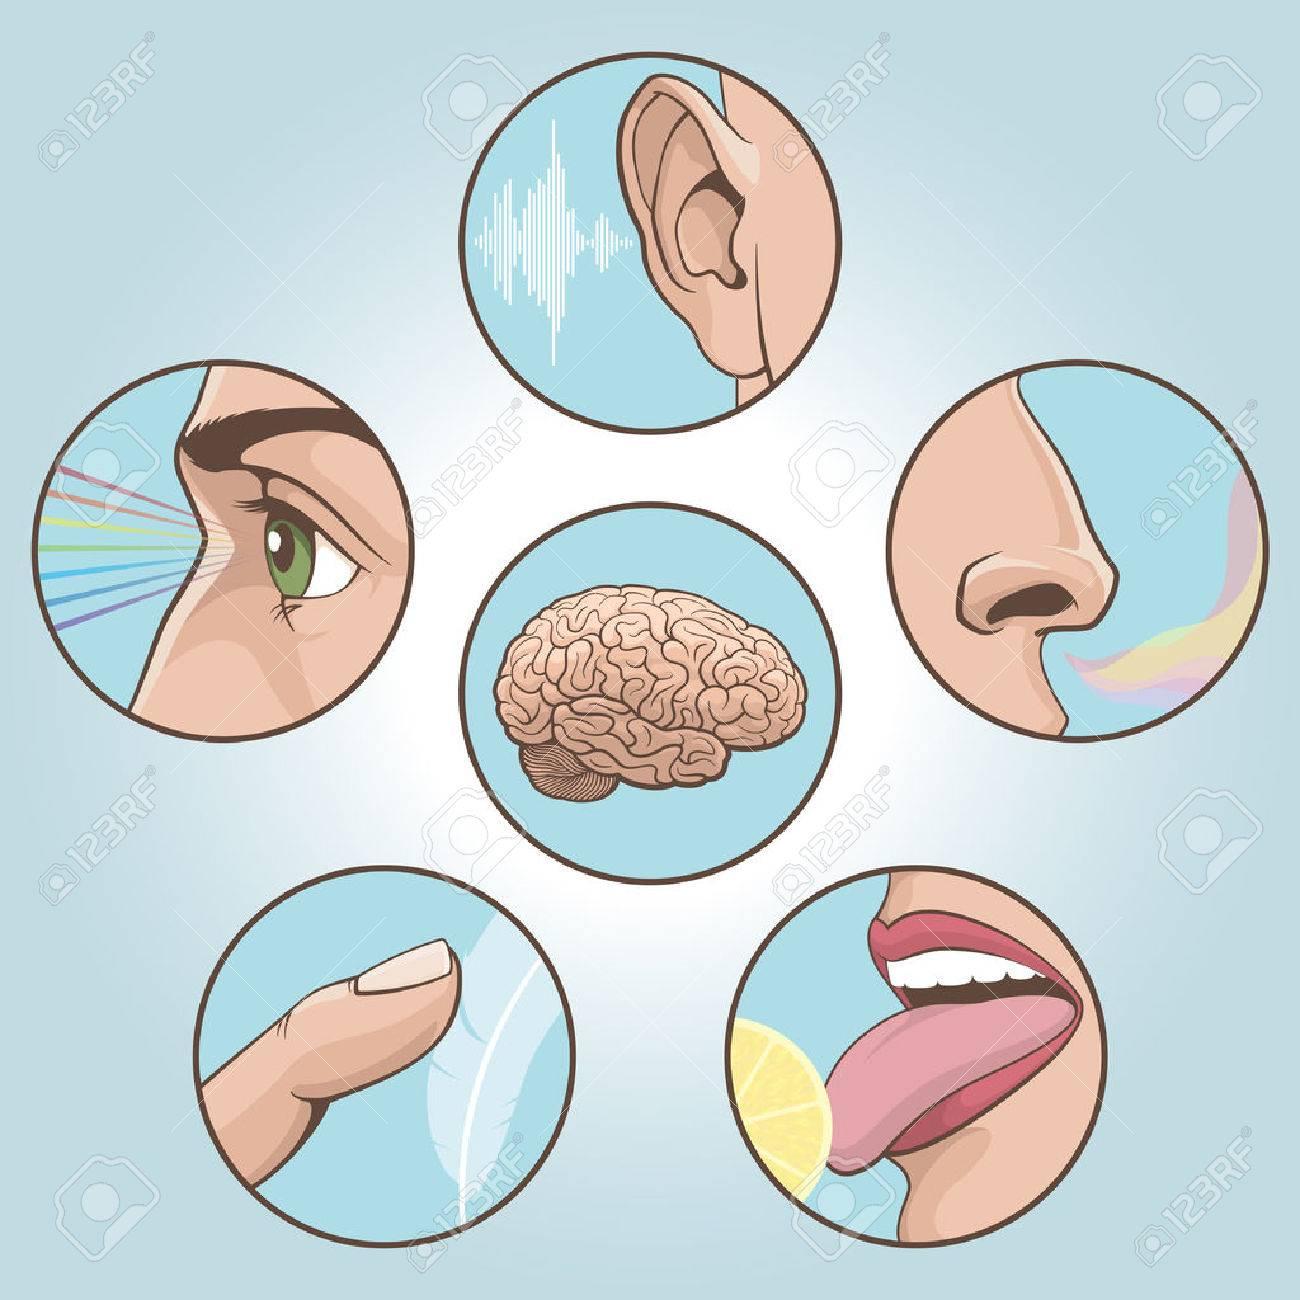 A set of six anatomical images. Vector illustration - 61185293